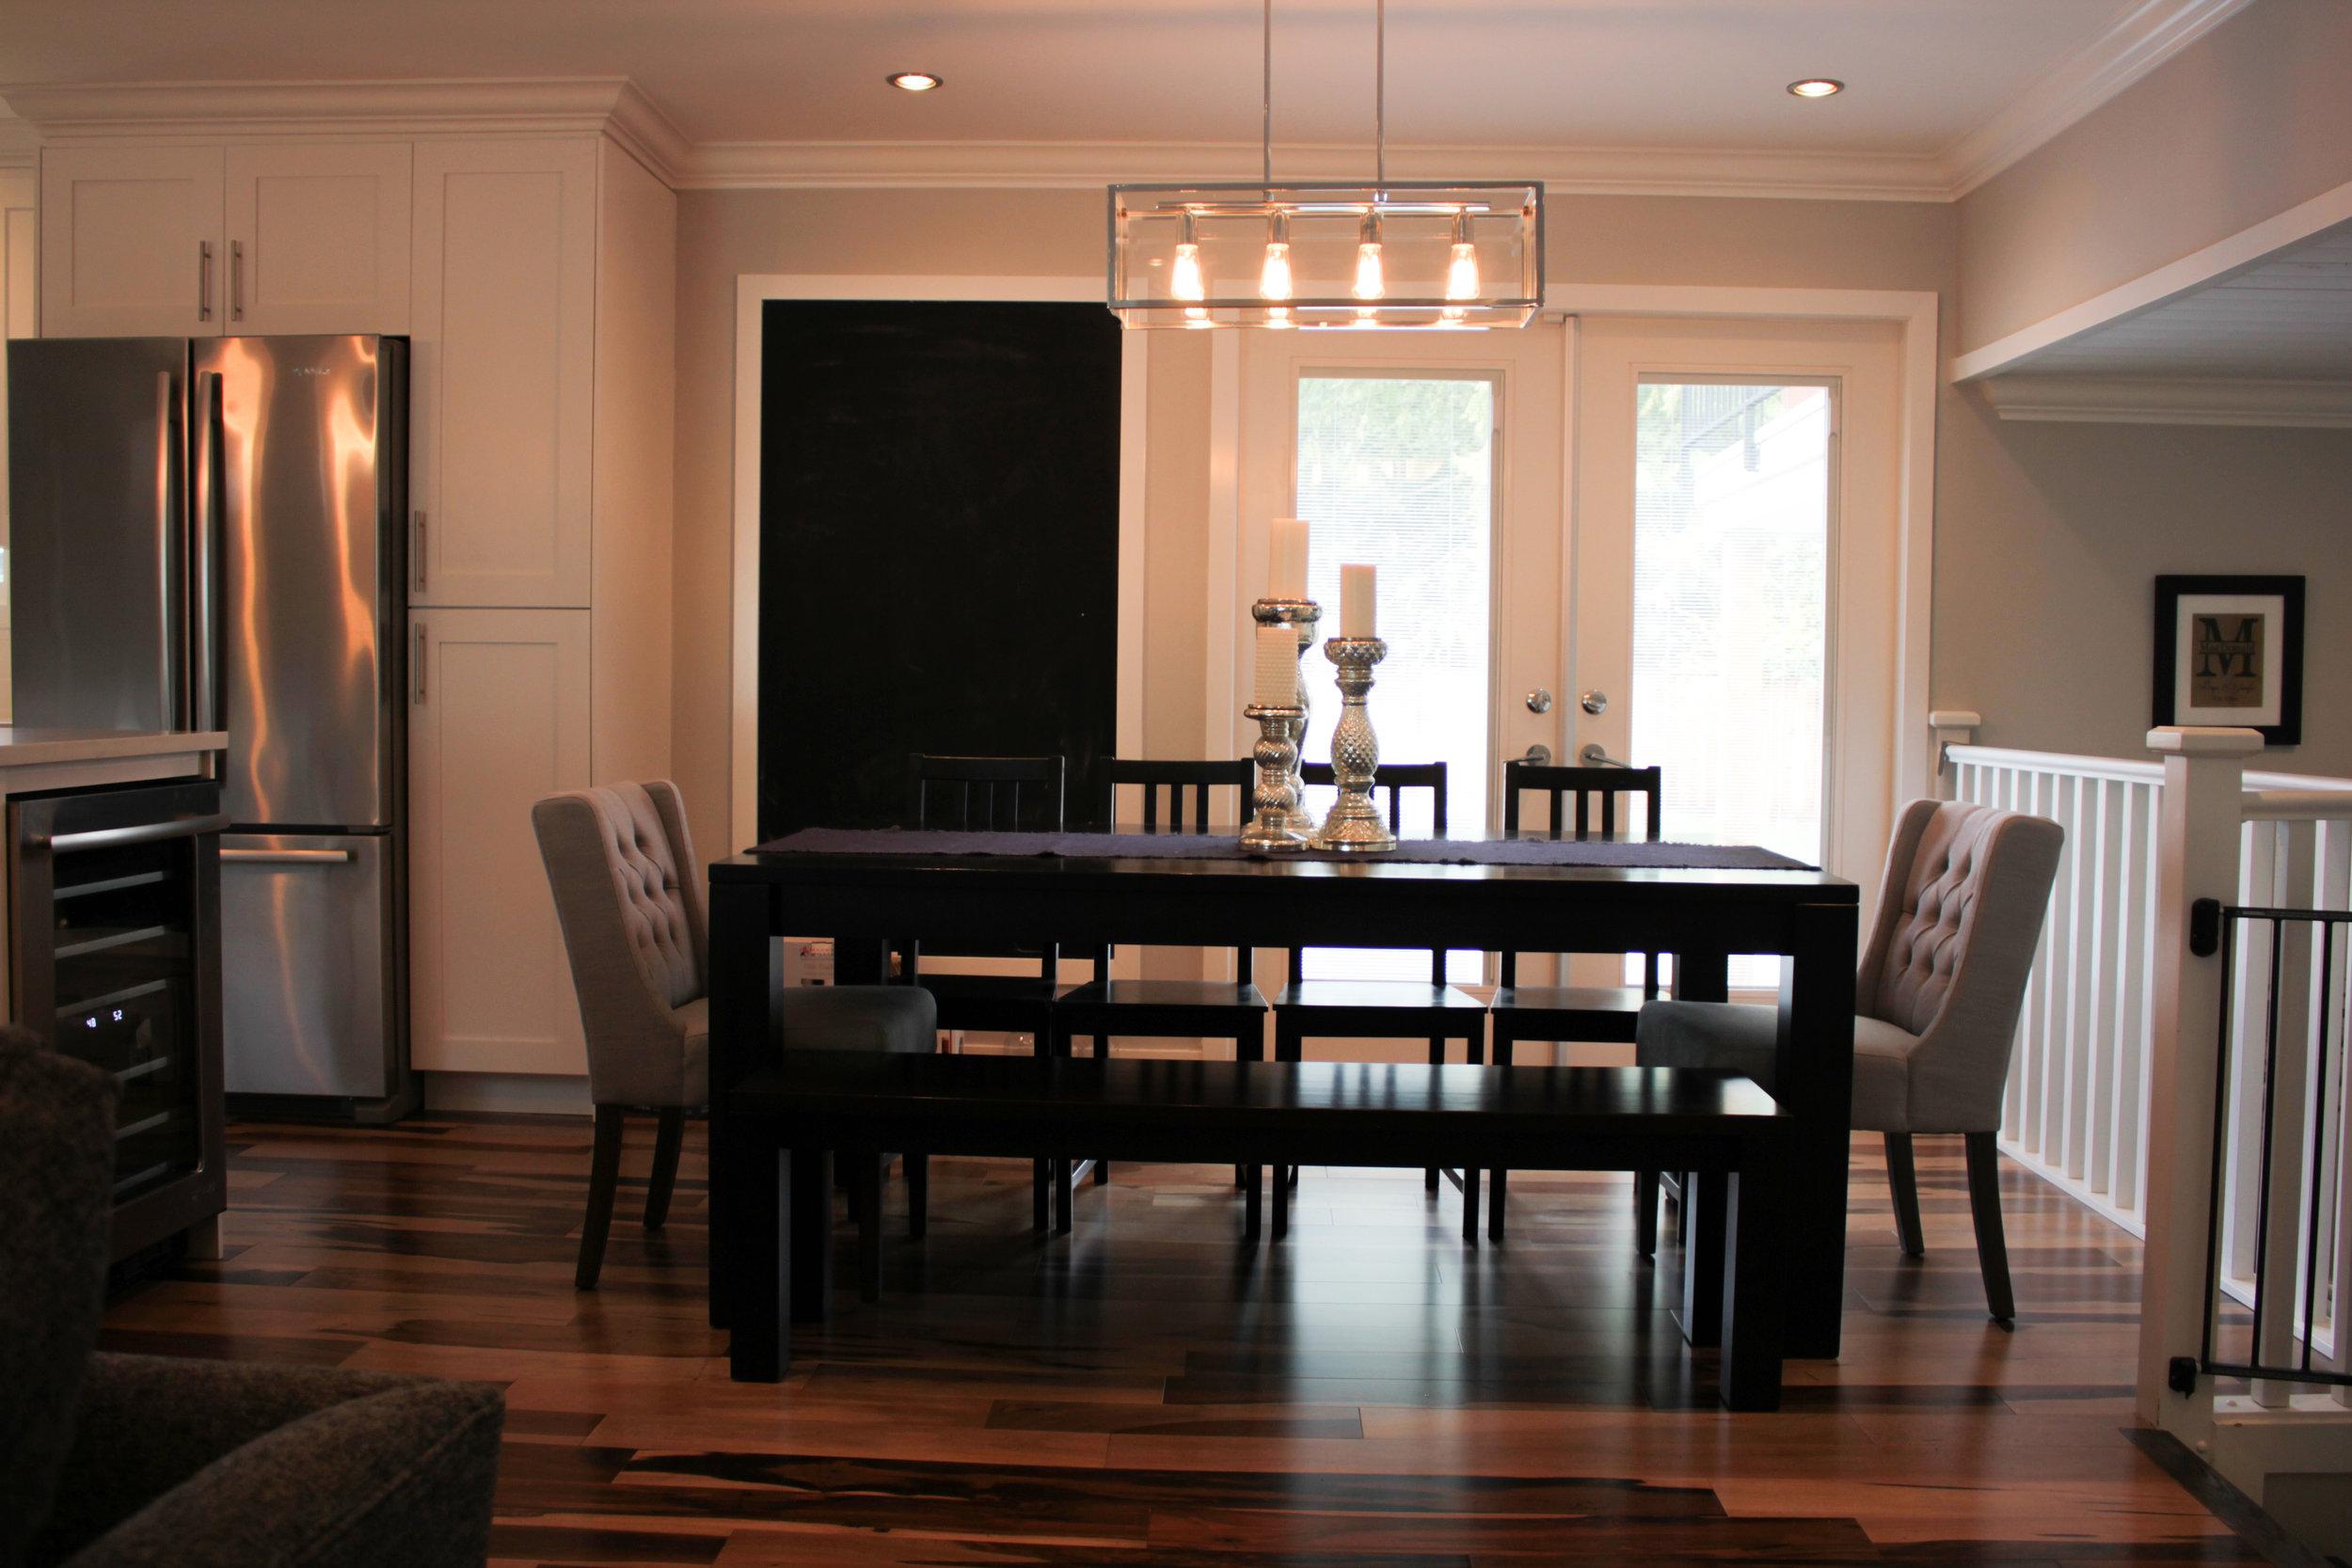 Kitchen_Table_2.JPG